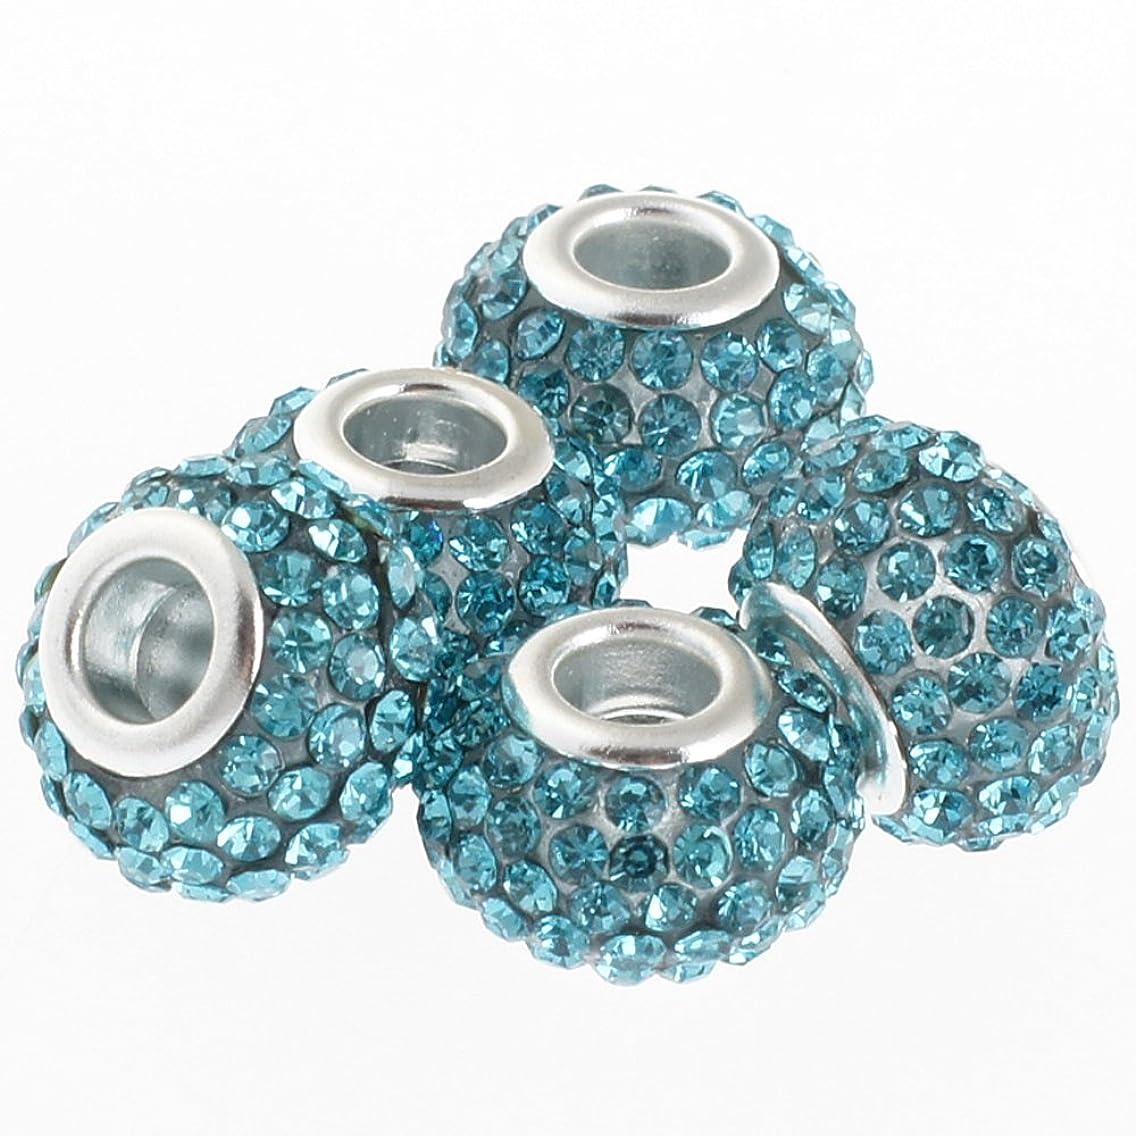 RUBYCA Big Hole Large Czech Crystal Charm Beads fit European Charm Bracelet (5pcs, Blue, 15mm)